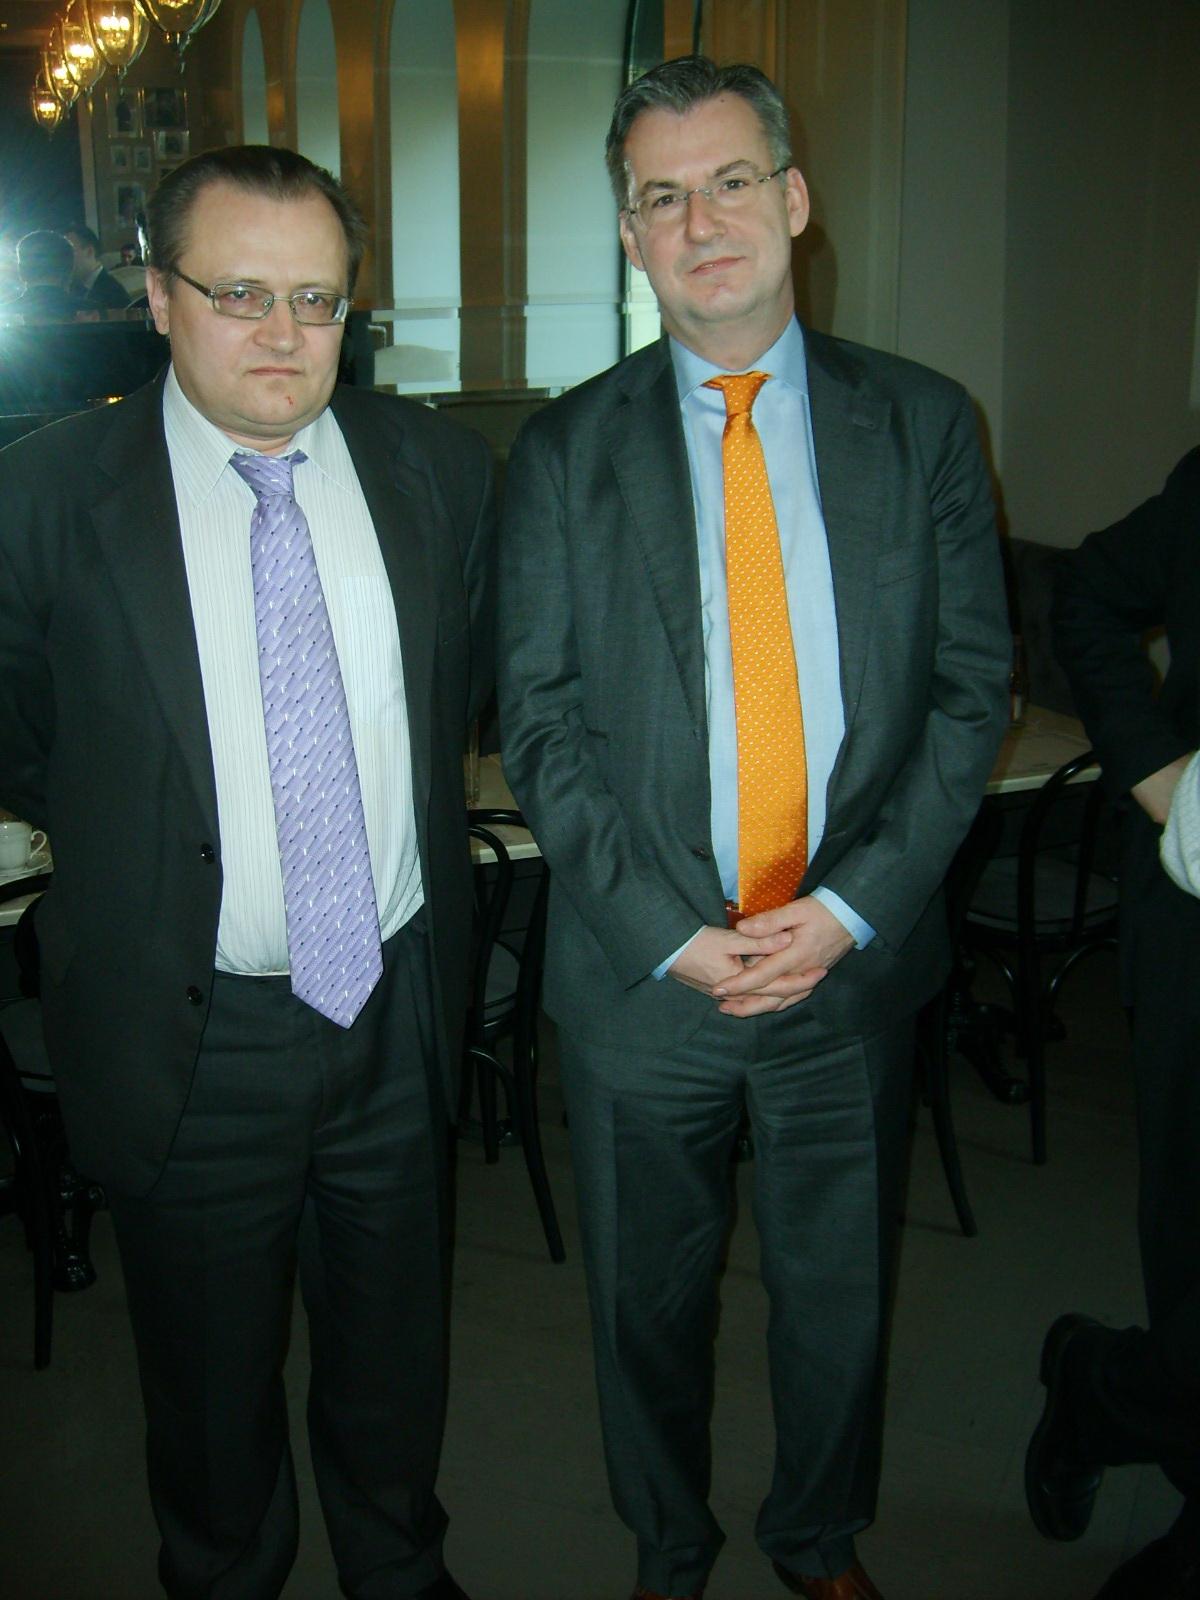 Shevtsov_Yuriy_Vyacheslavovich_2014_02_17_Dirk_Schuebel_Eastern_Partnership_European_External_Action_Service